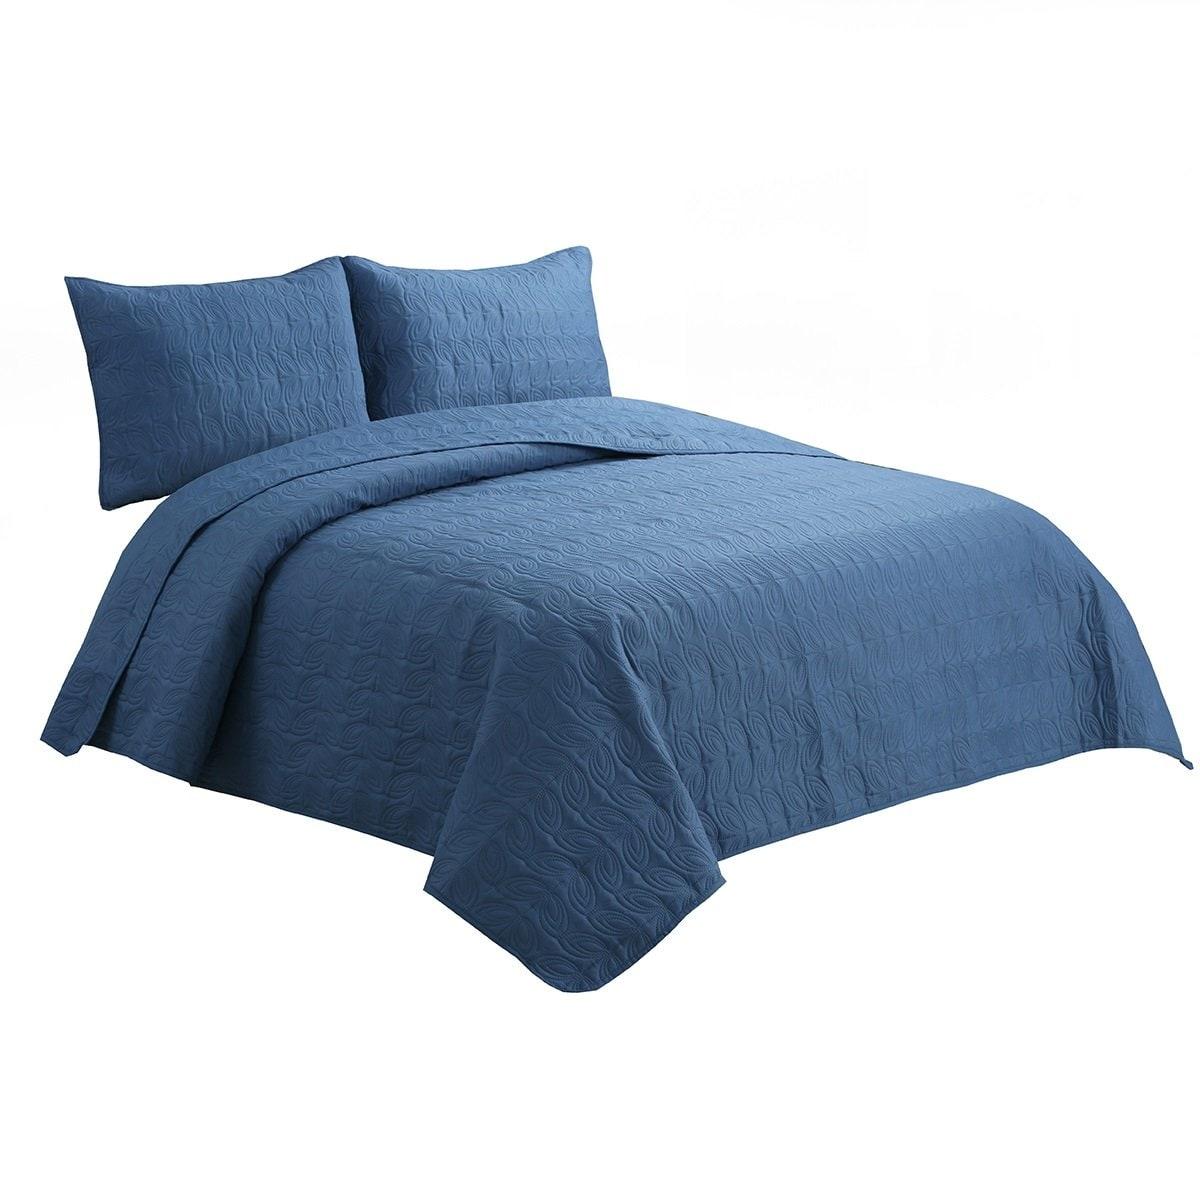 Edrecolcha Lif Azul 4 Home Nature - King Size